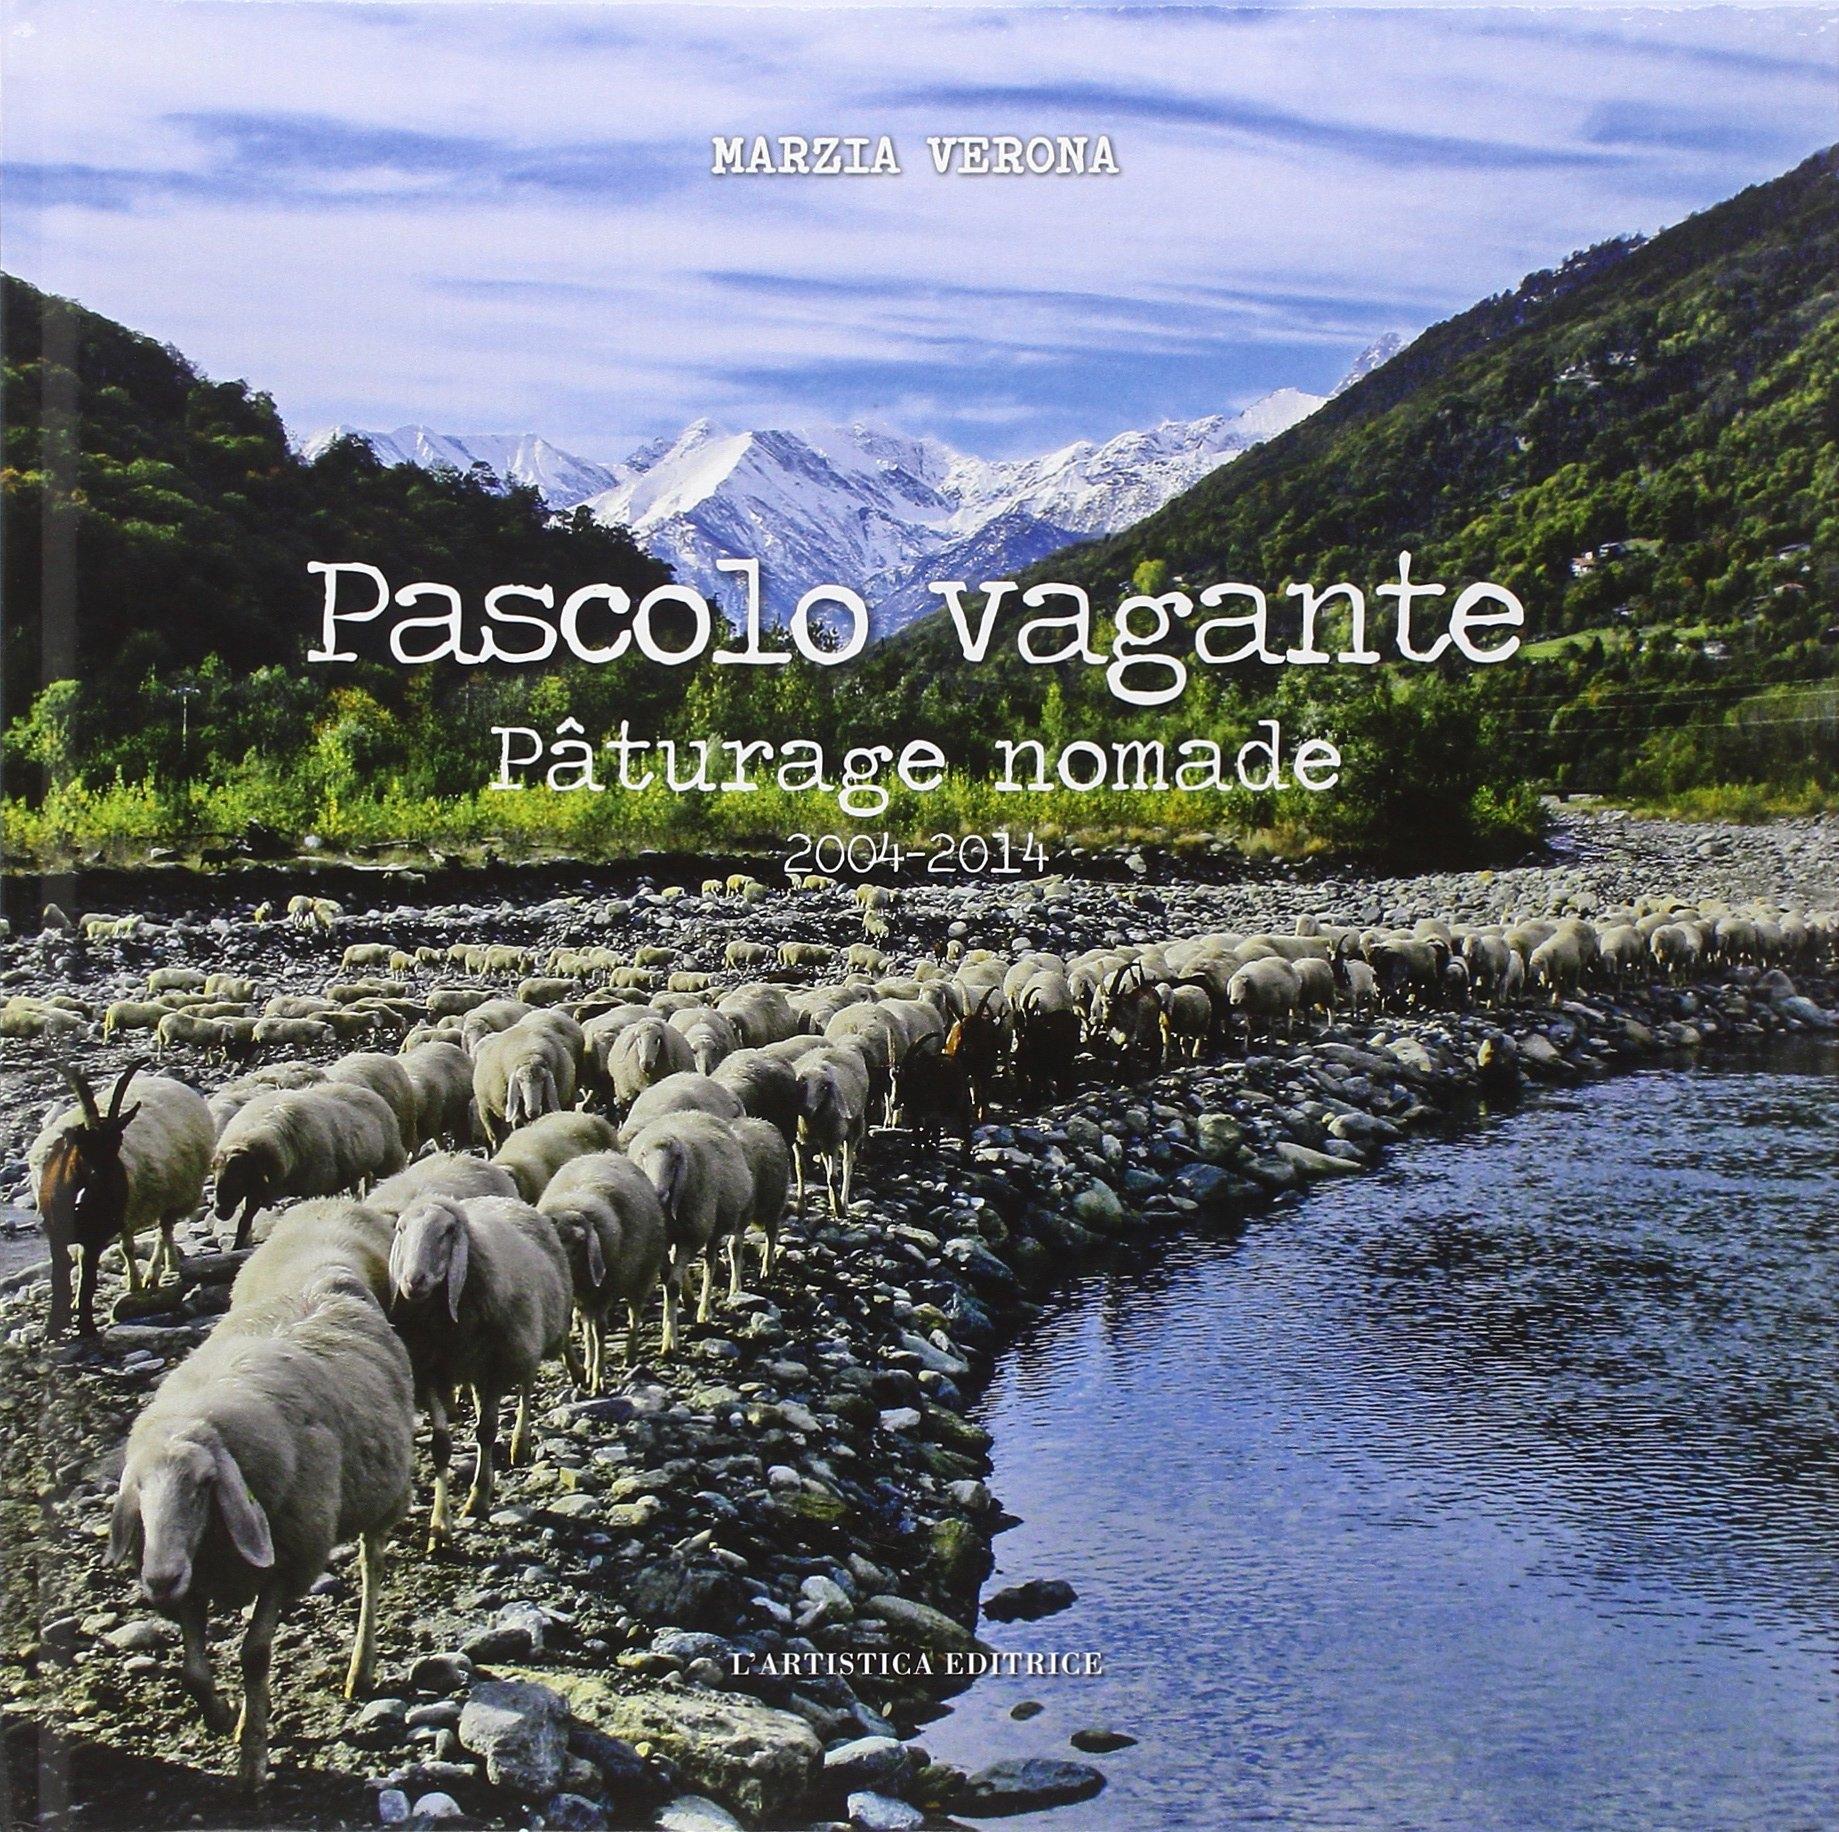 Pascolo Vagantepaturage Nomade. 2004-2014